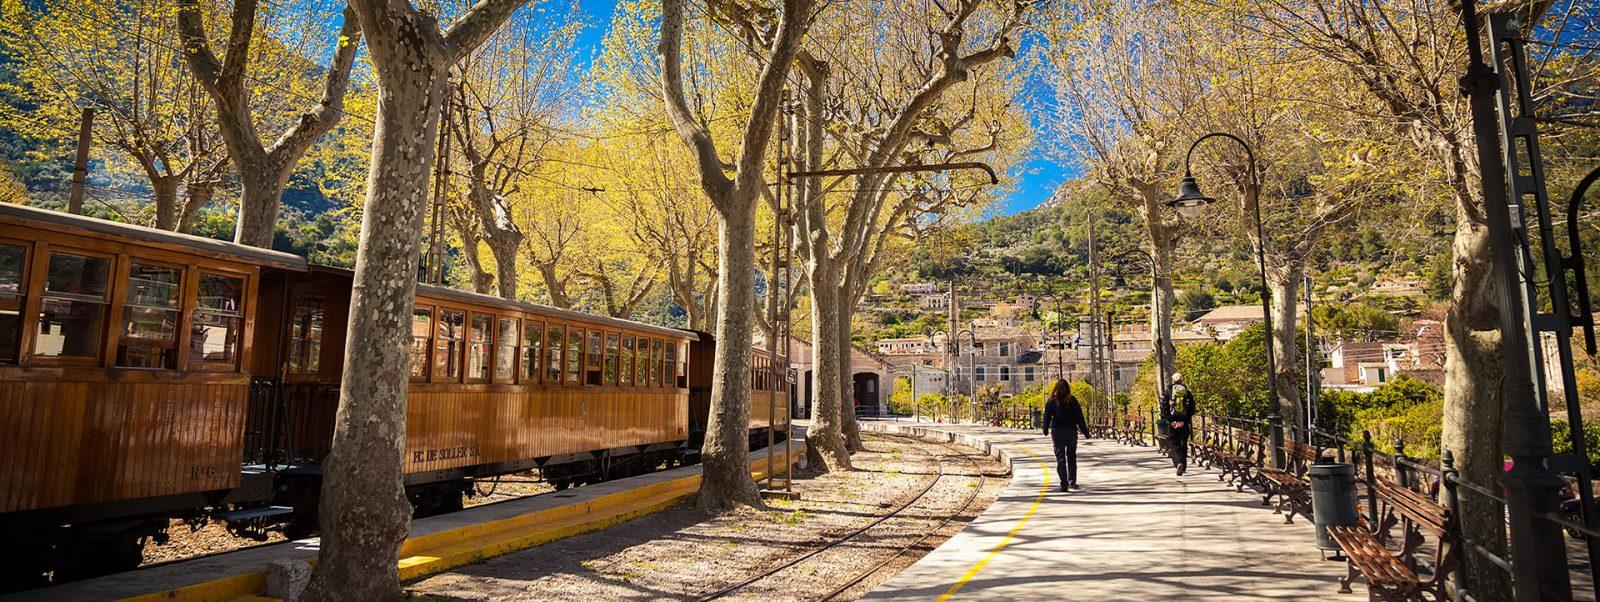 Historische Bahnfahrt mit dem Tren de Sóller